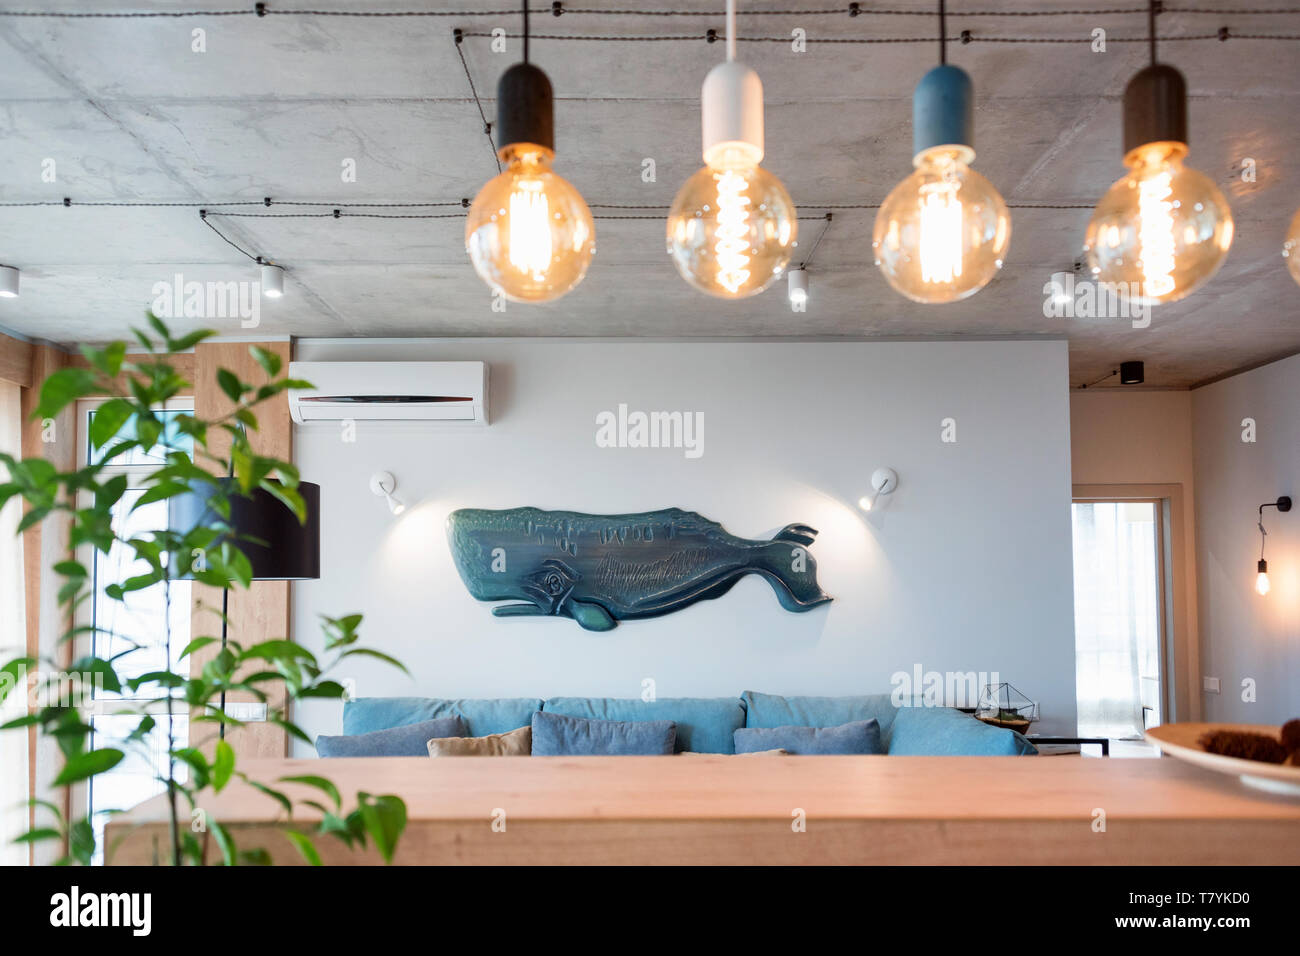 Minimalist Modern Living Room With Sofa In Loft Style Flat